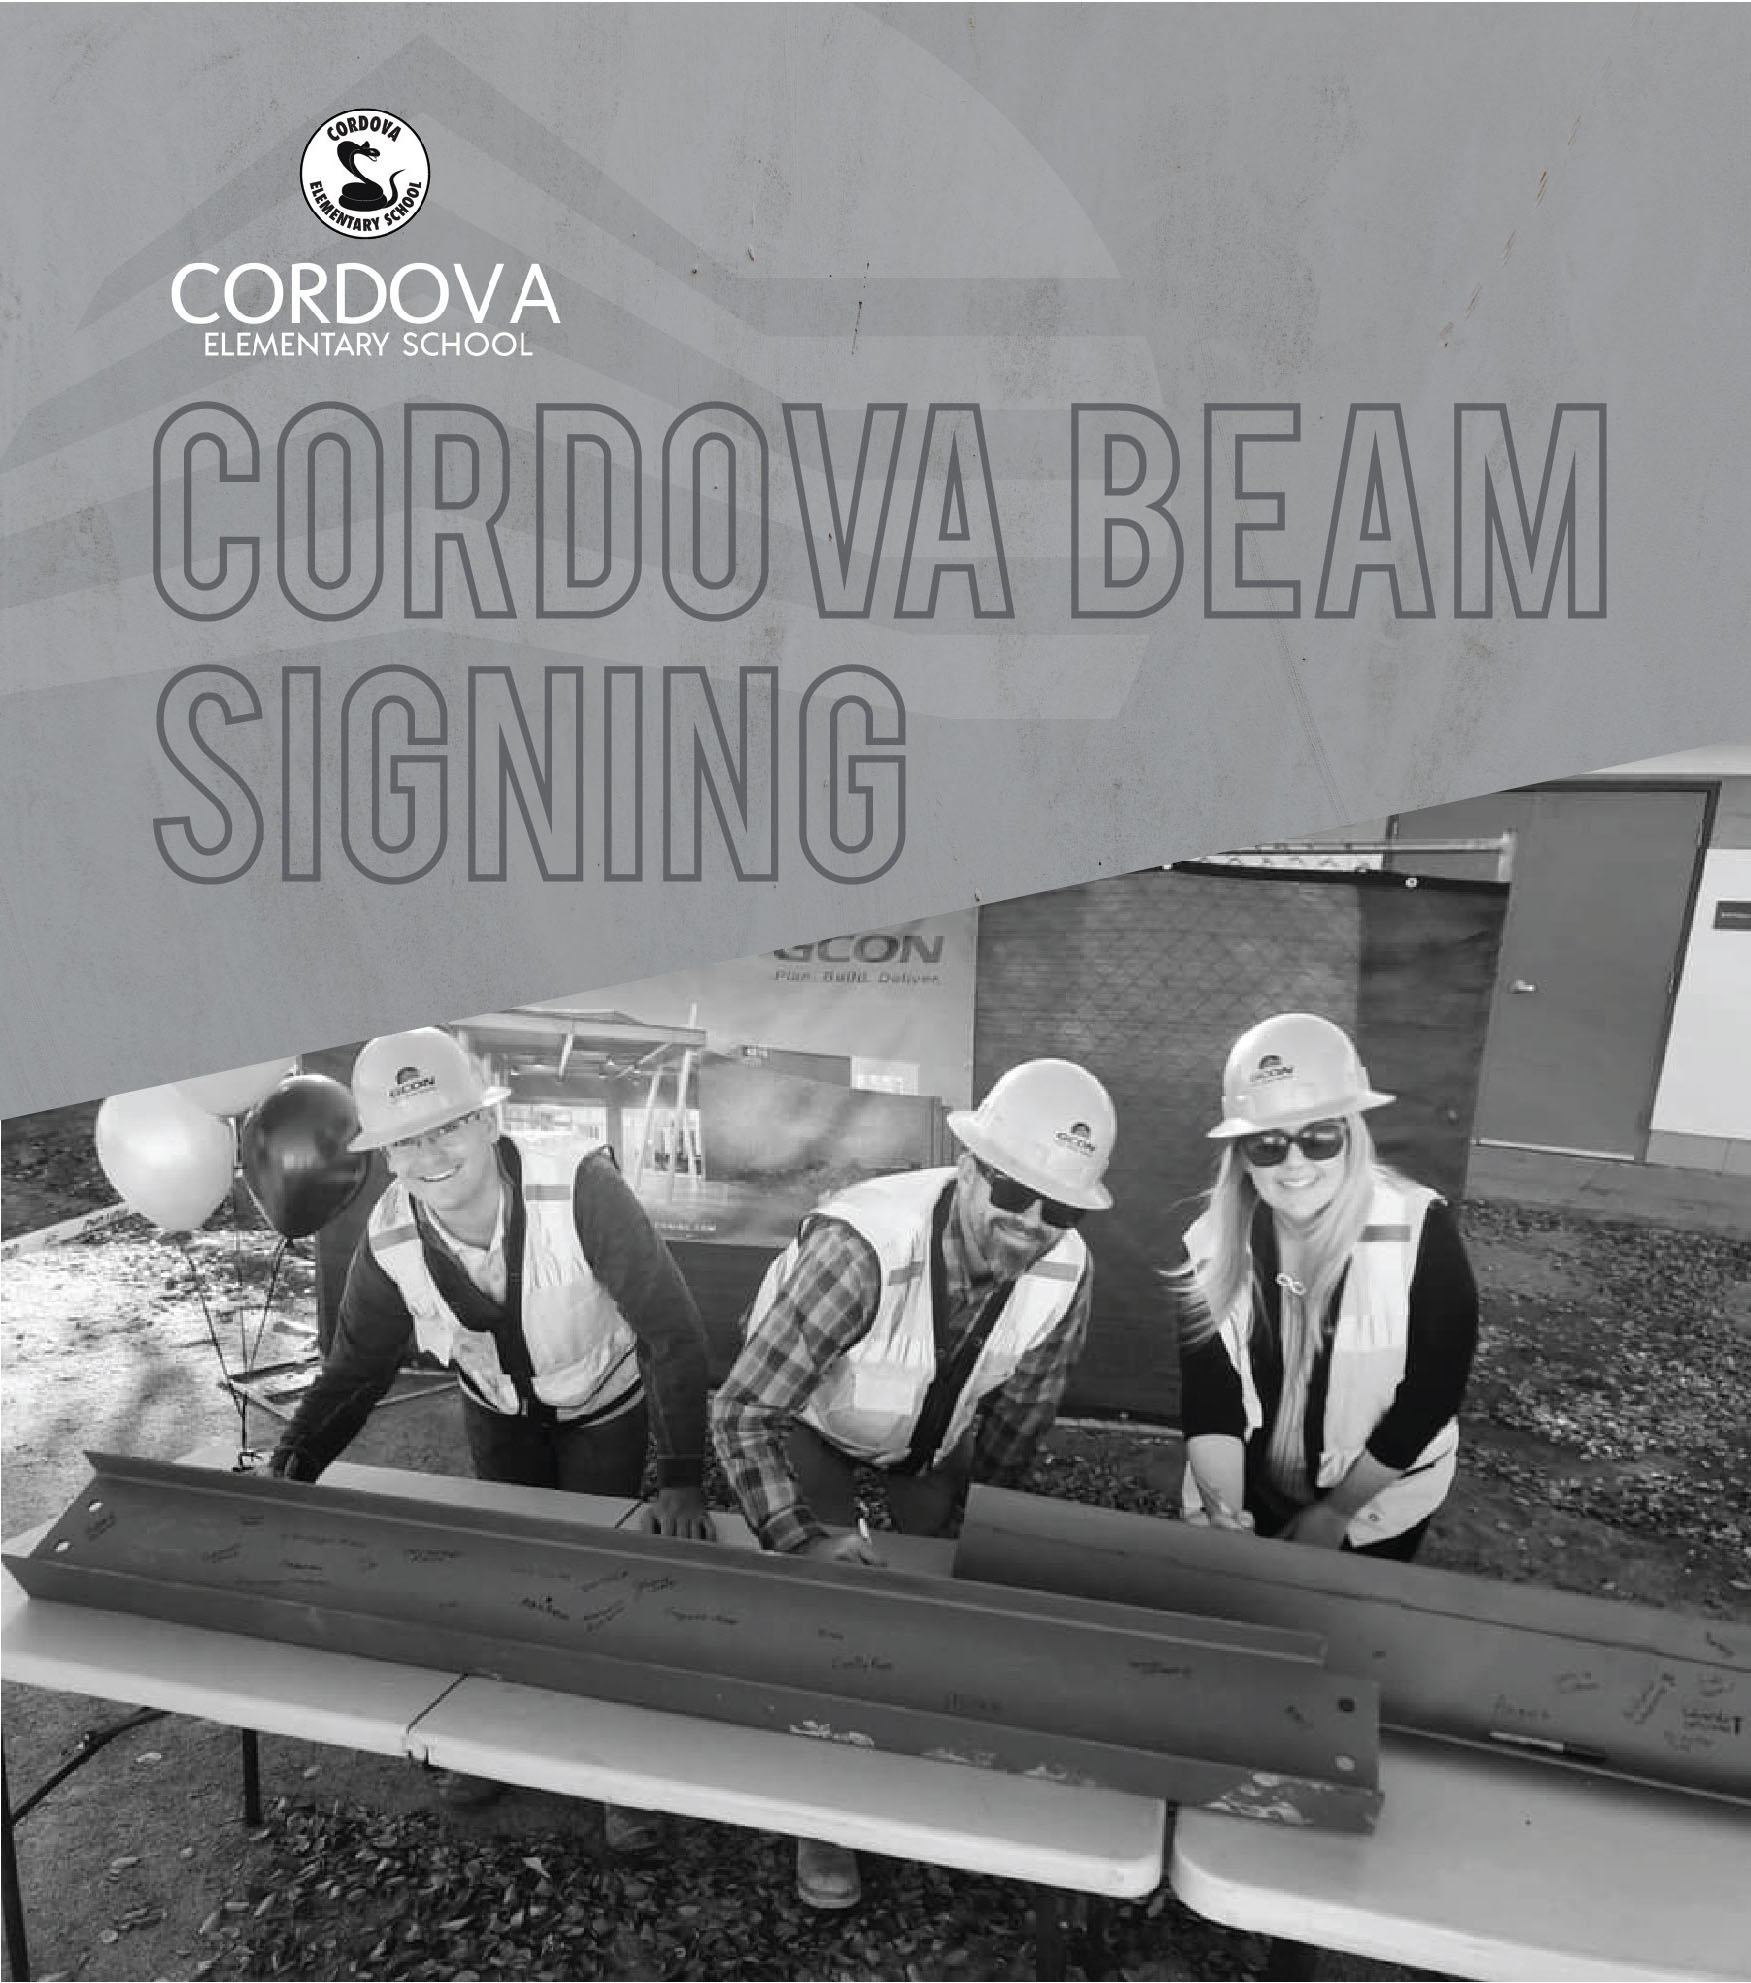 Cordova Elementary School Beam Signing